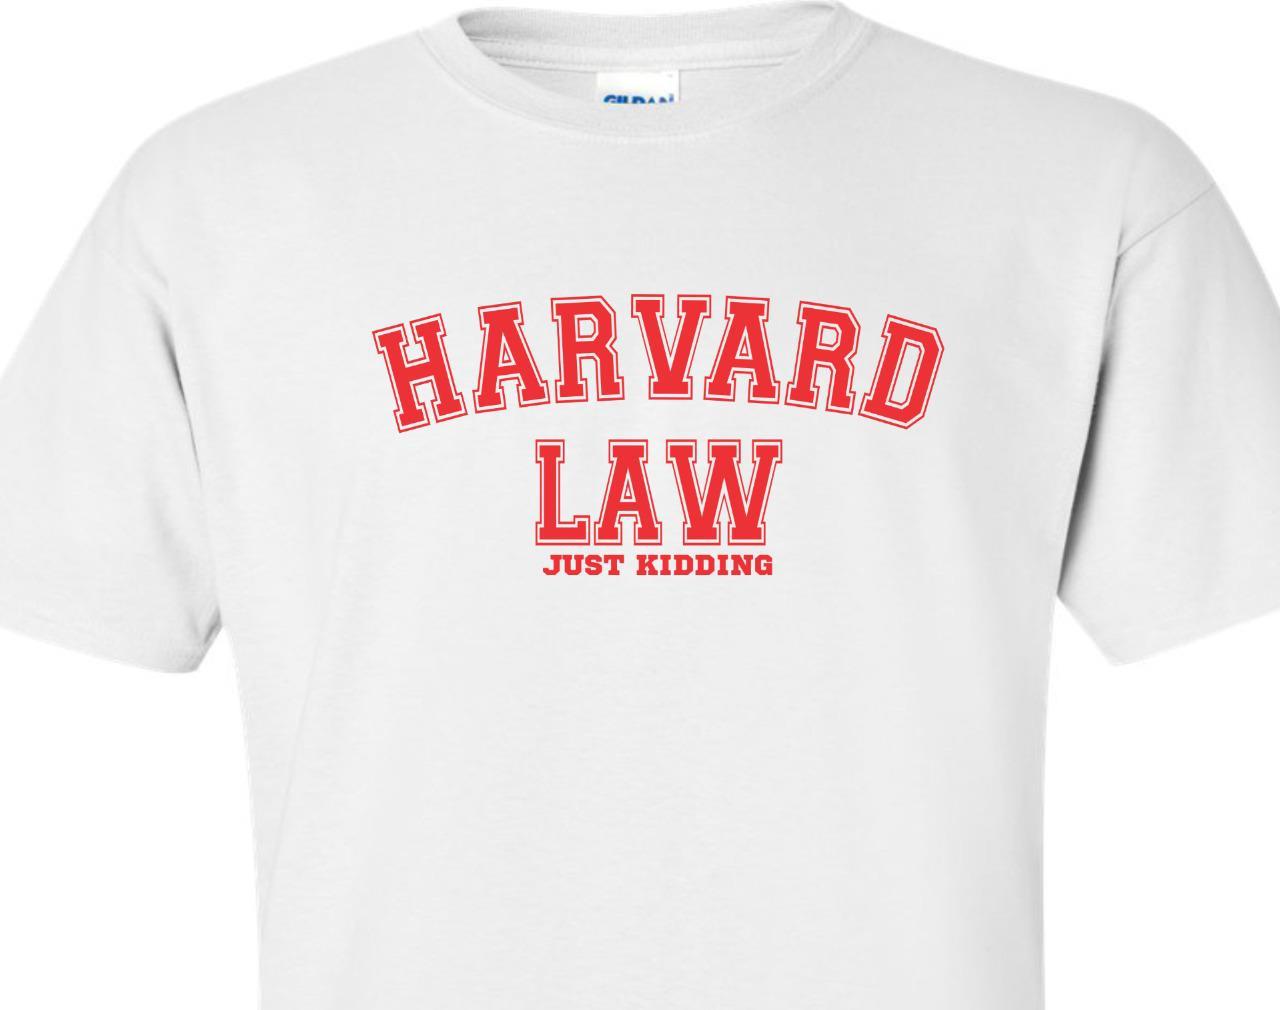 Harvard law just kidding tee shirt funny humor band nerd for Frat pocket t shirts